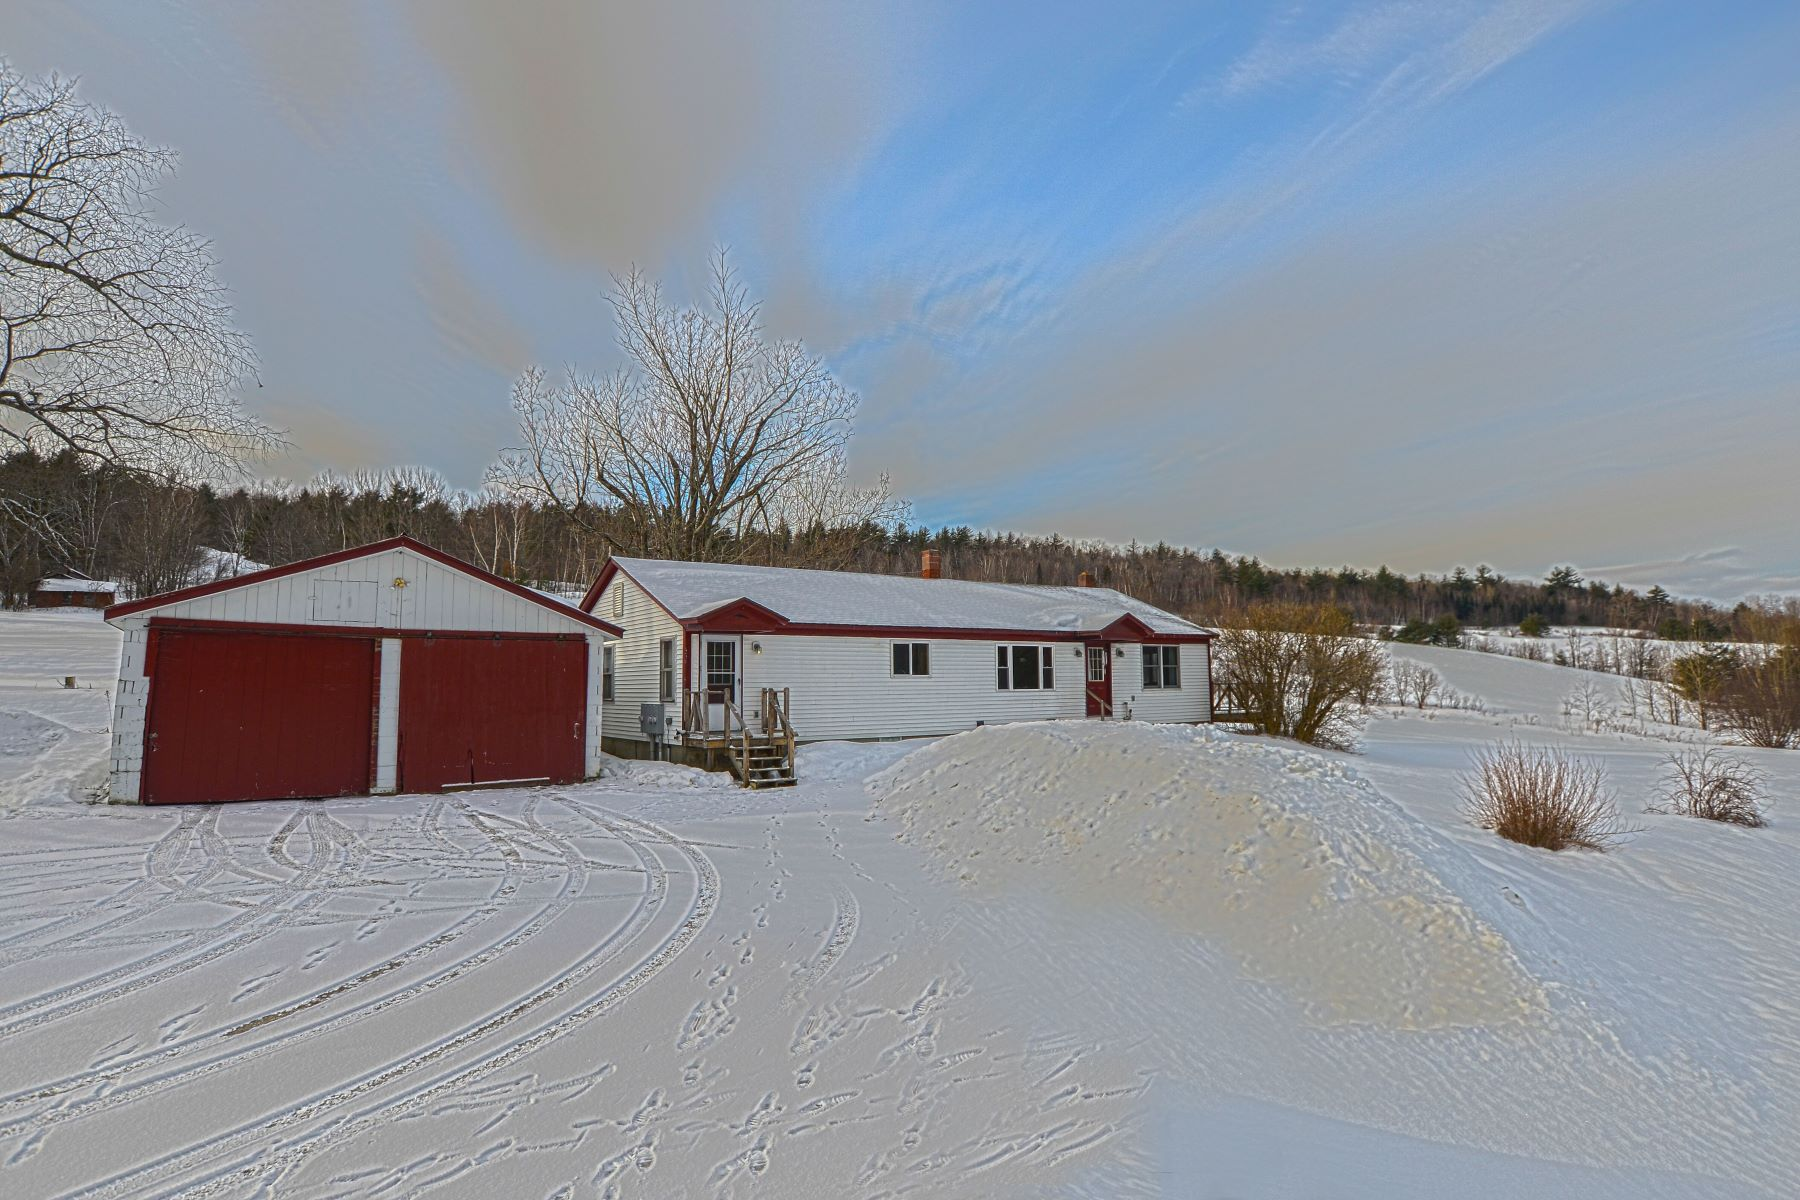 Single Family Home for Sale at Rodiman Road 16 Rodimon Ln Piermont, New Hampshire 03779 United States